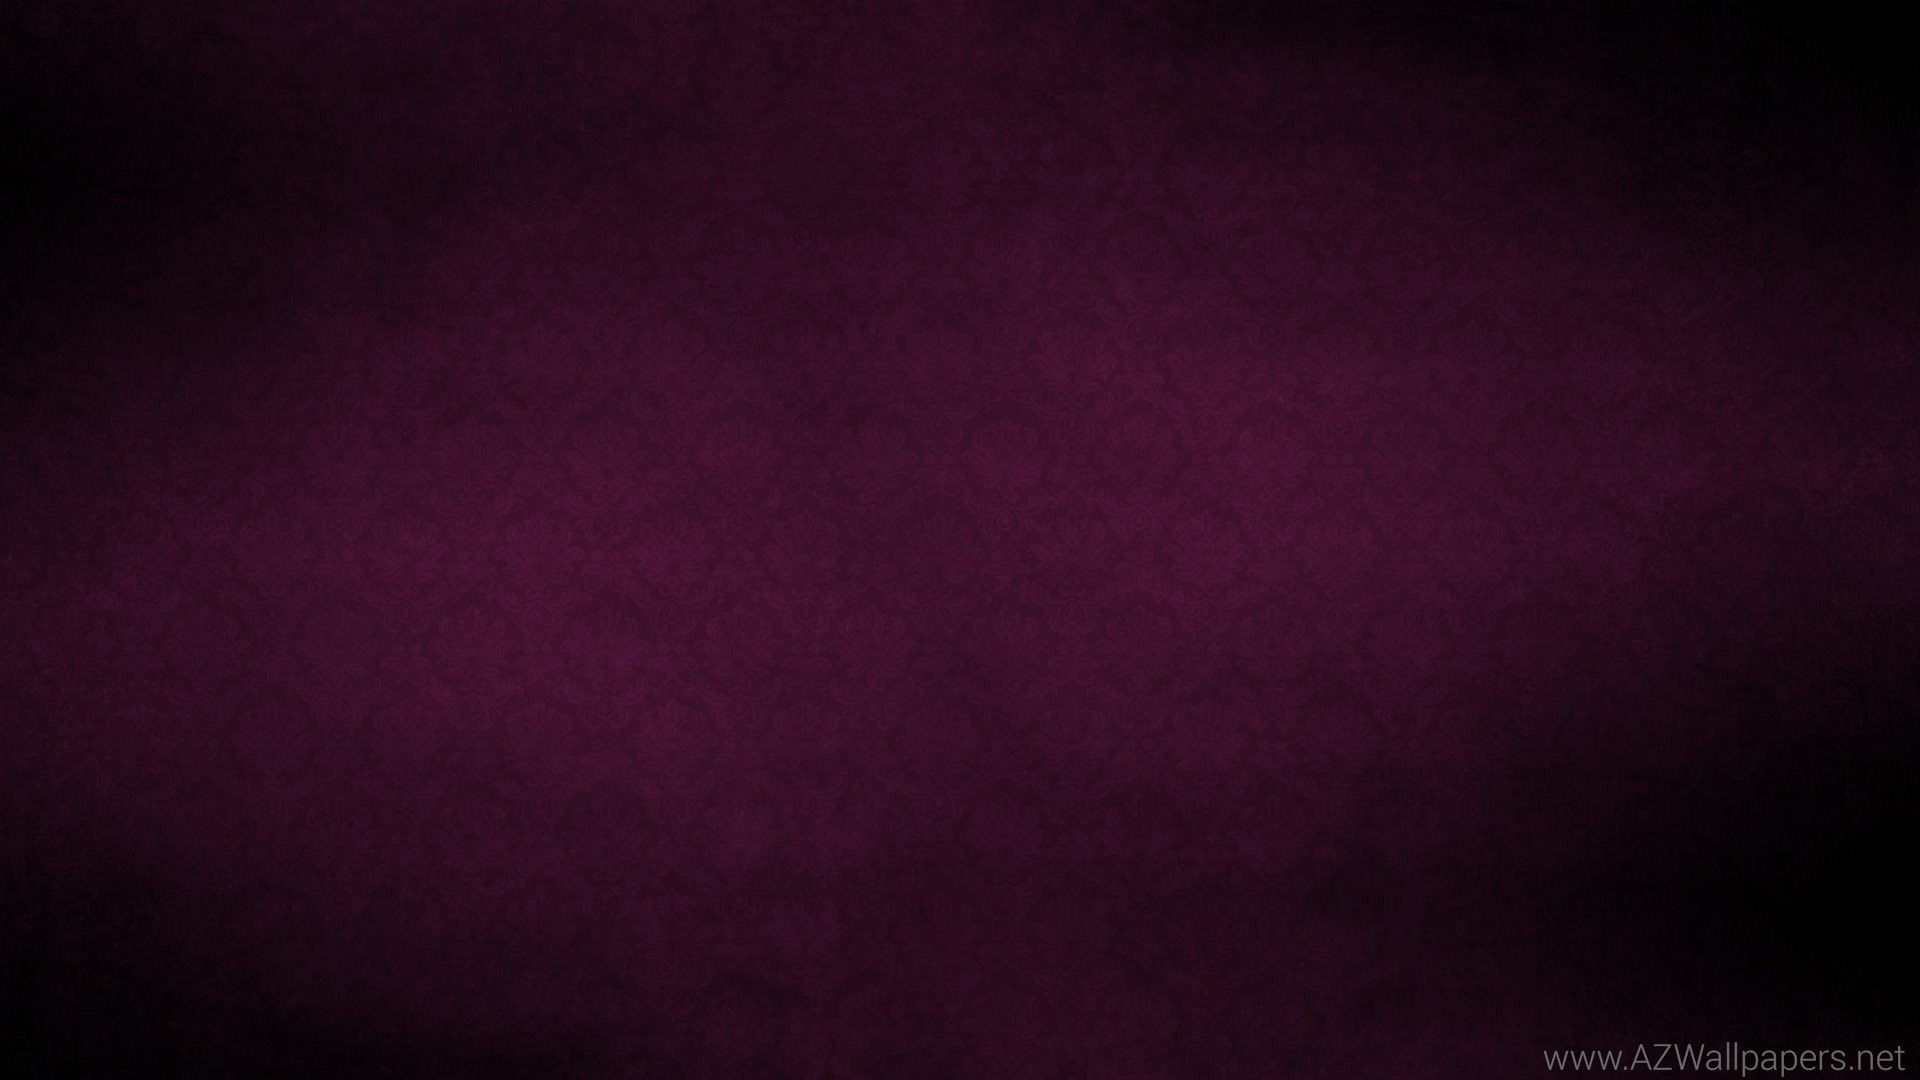 FaZe Rain Wallpaper, Mobile Compatible FaZe Rain Wallpapers, FaZe .